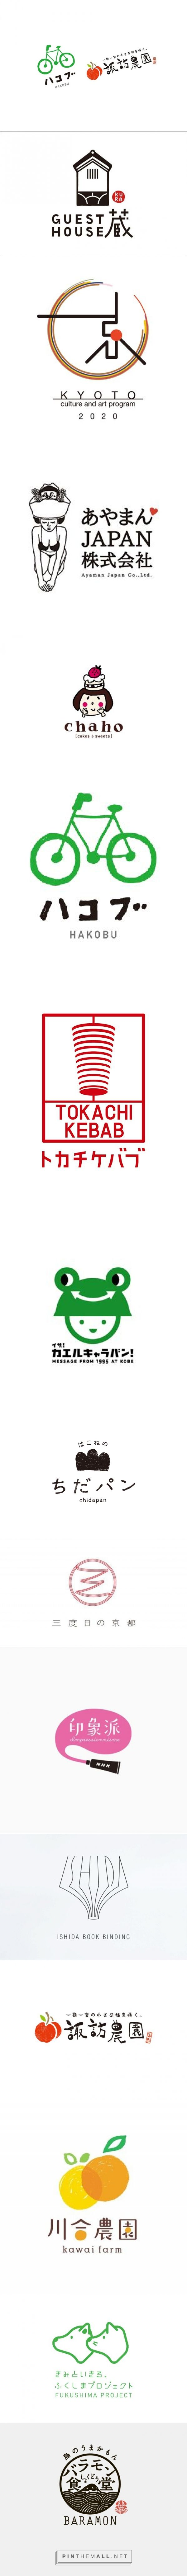 Quirky Japanese Logos | Abduzeedo Design Inspiration - created via…